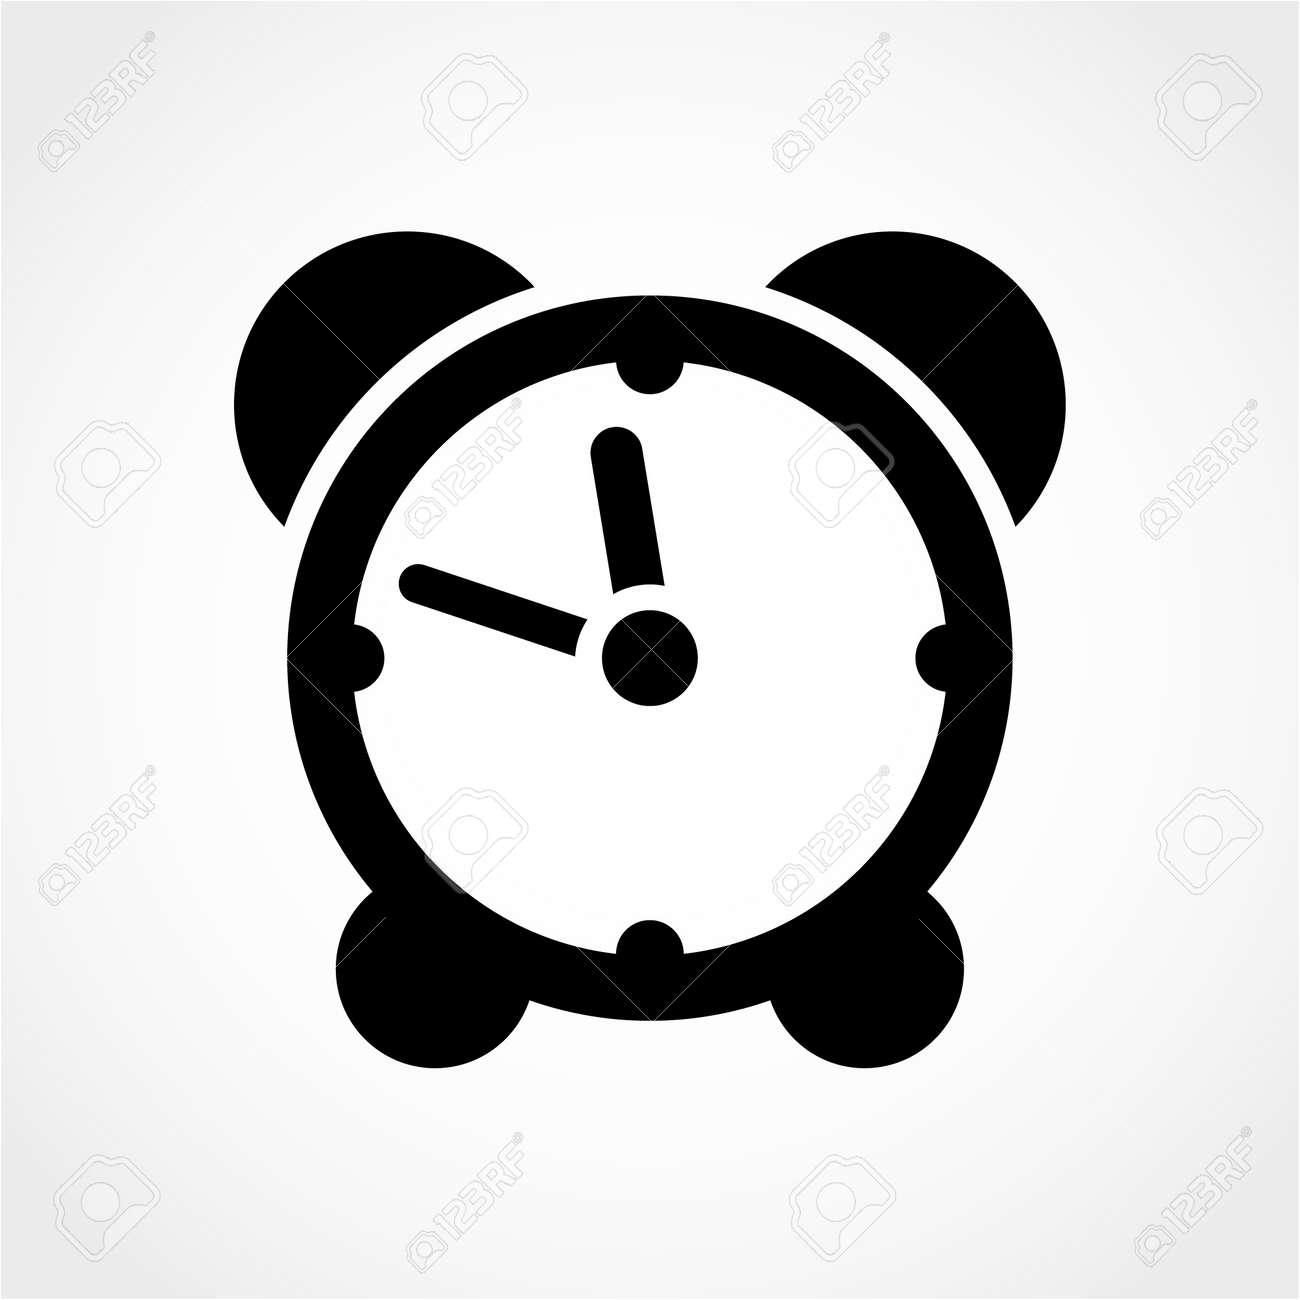 Clock Icon Isolated on White Background - 50991400